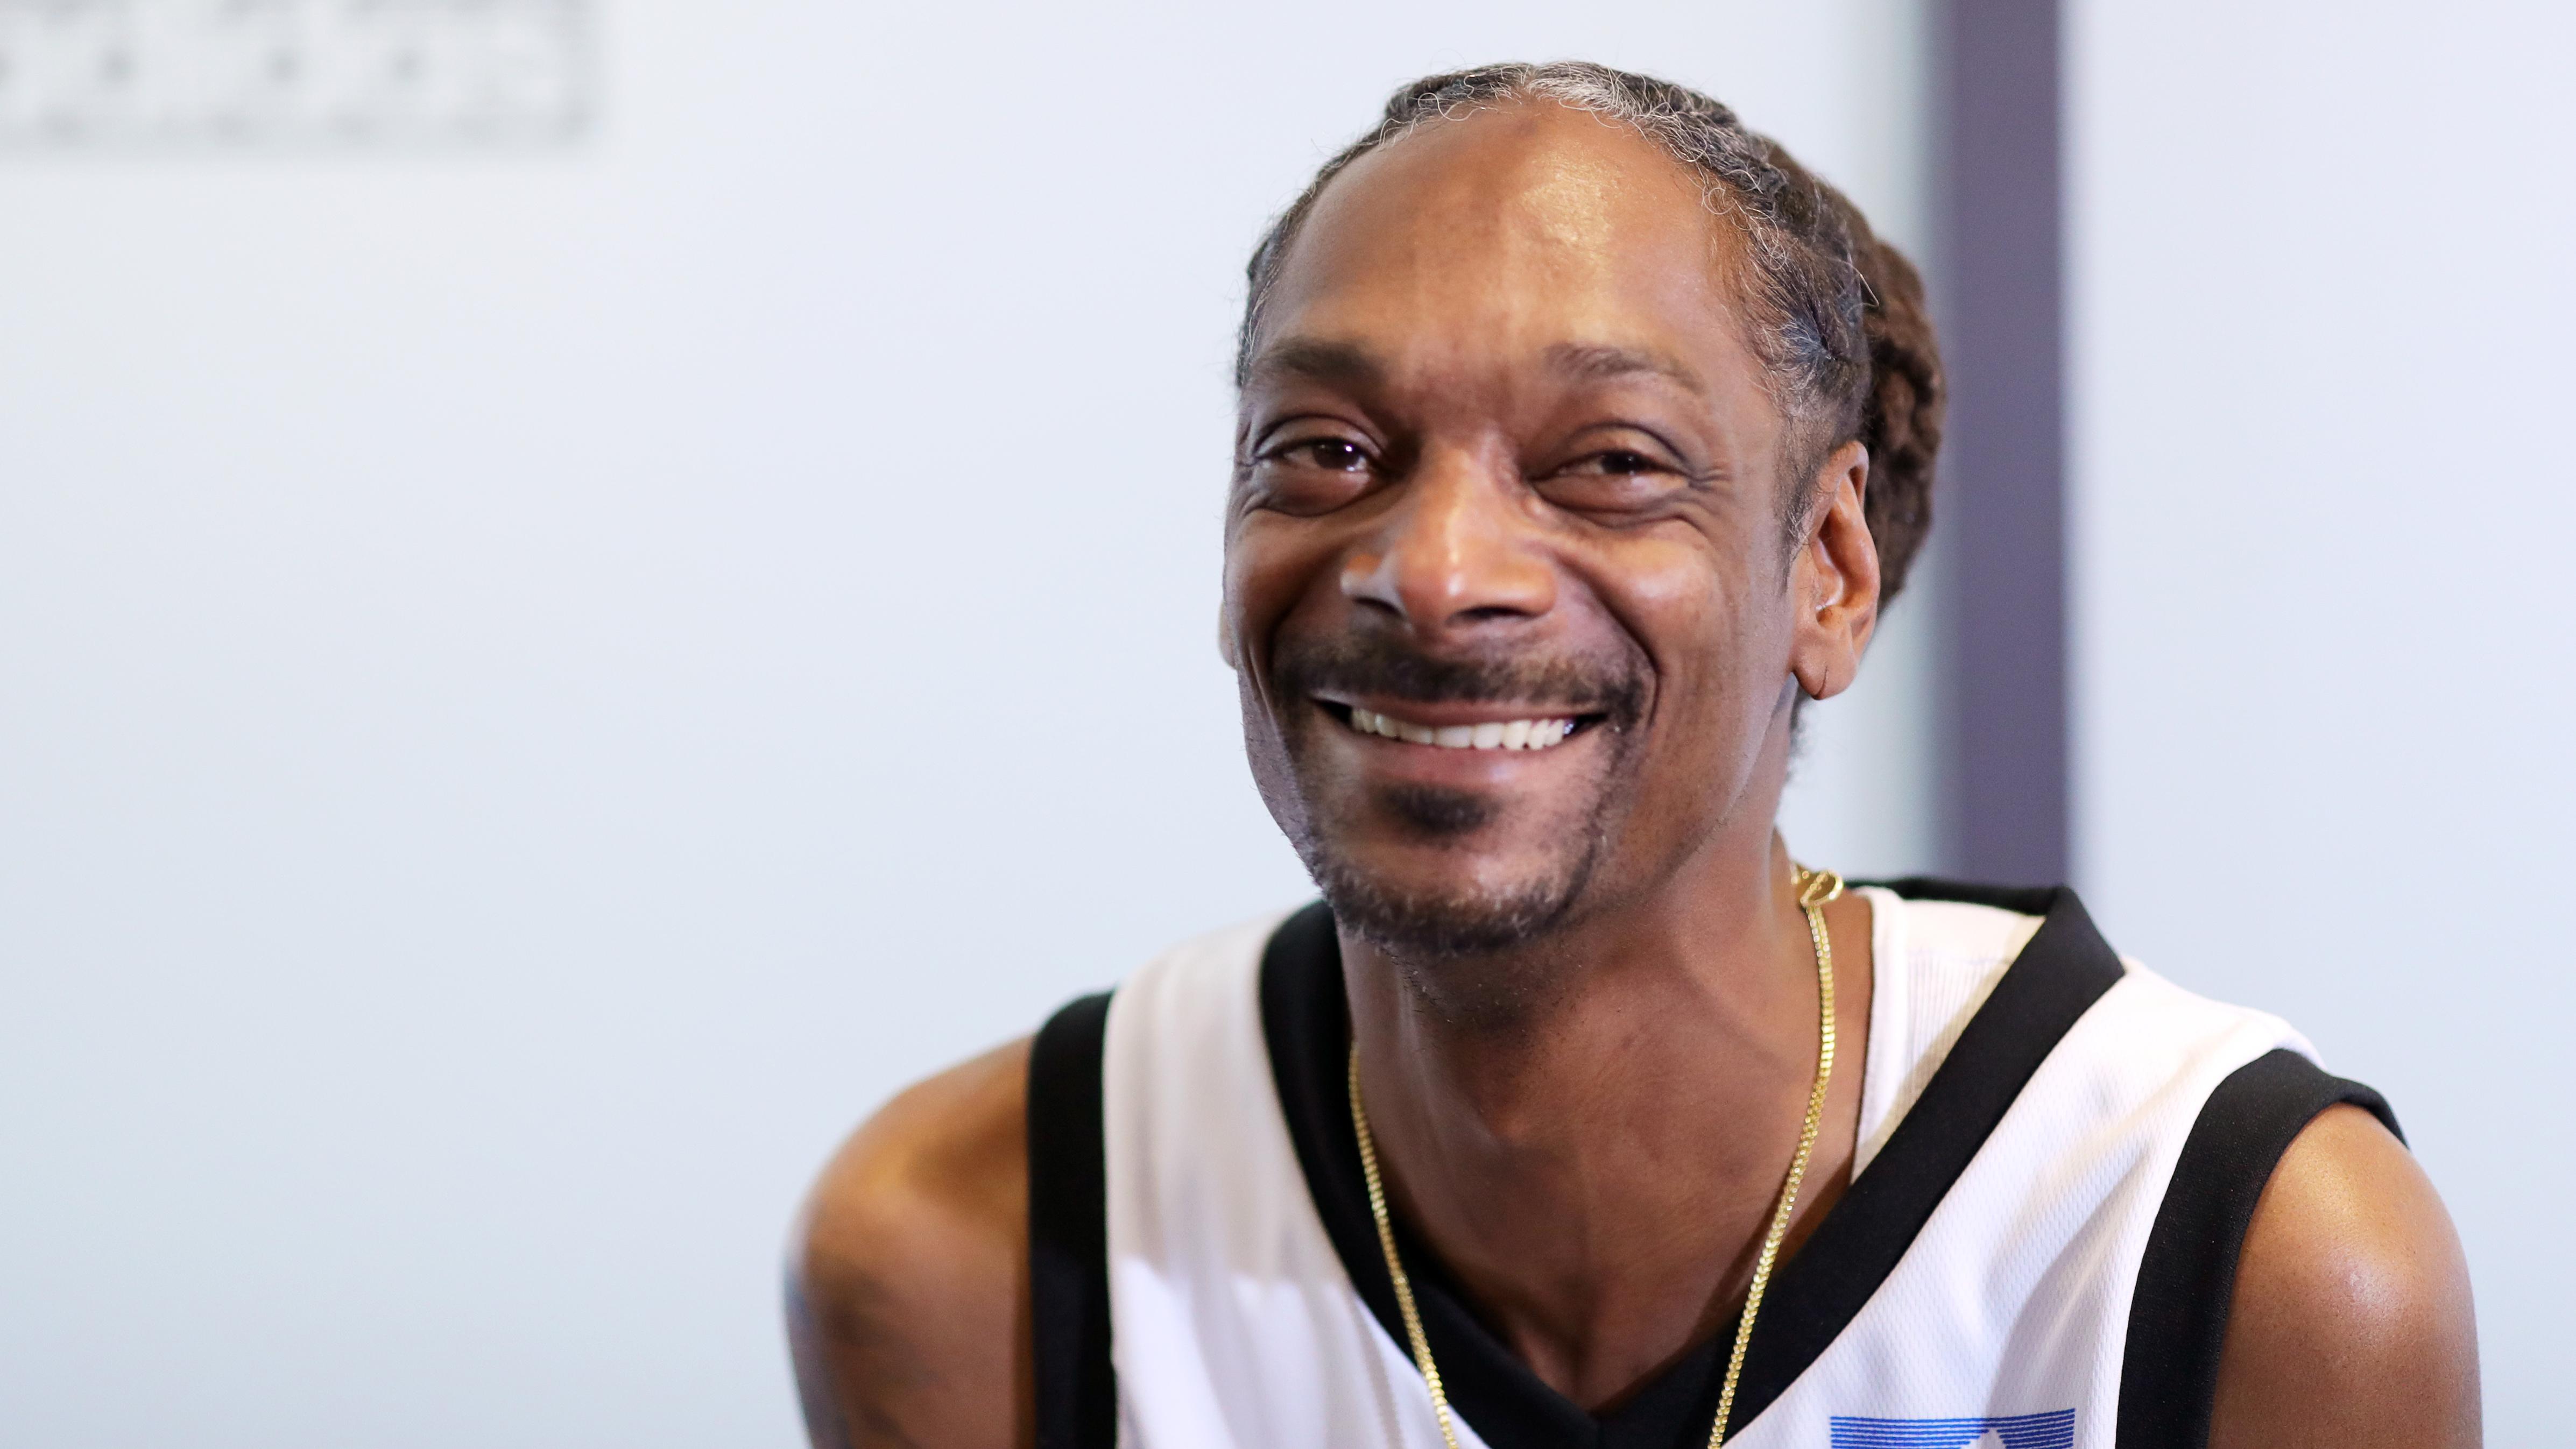 Snoop Dogg Disses Trump, Smokes a Blunt Outside White House | NBC Washington